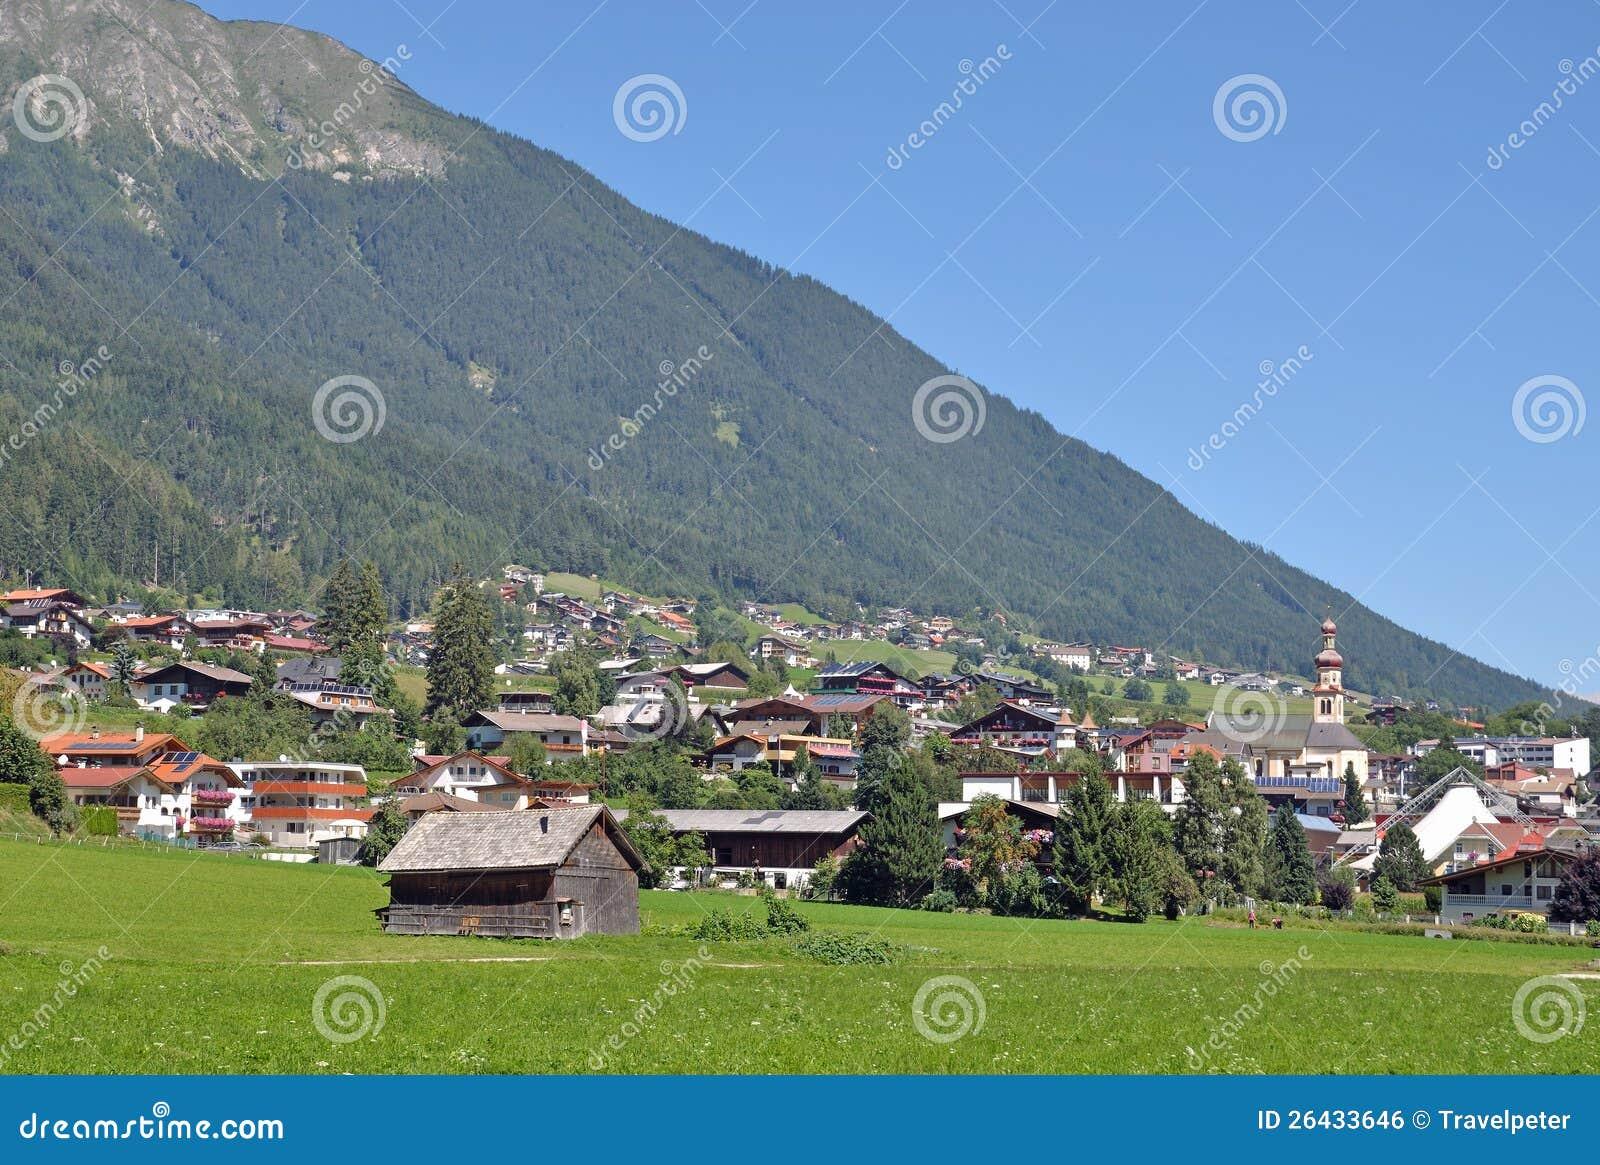 Fulpmes Austria  city pictures gallery : Fulpmes,Stubaital,Tirol,Austria Royalty Free Stock Image Image ...